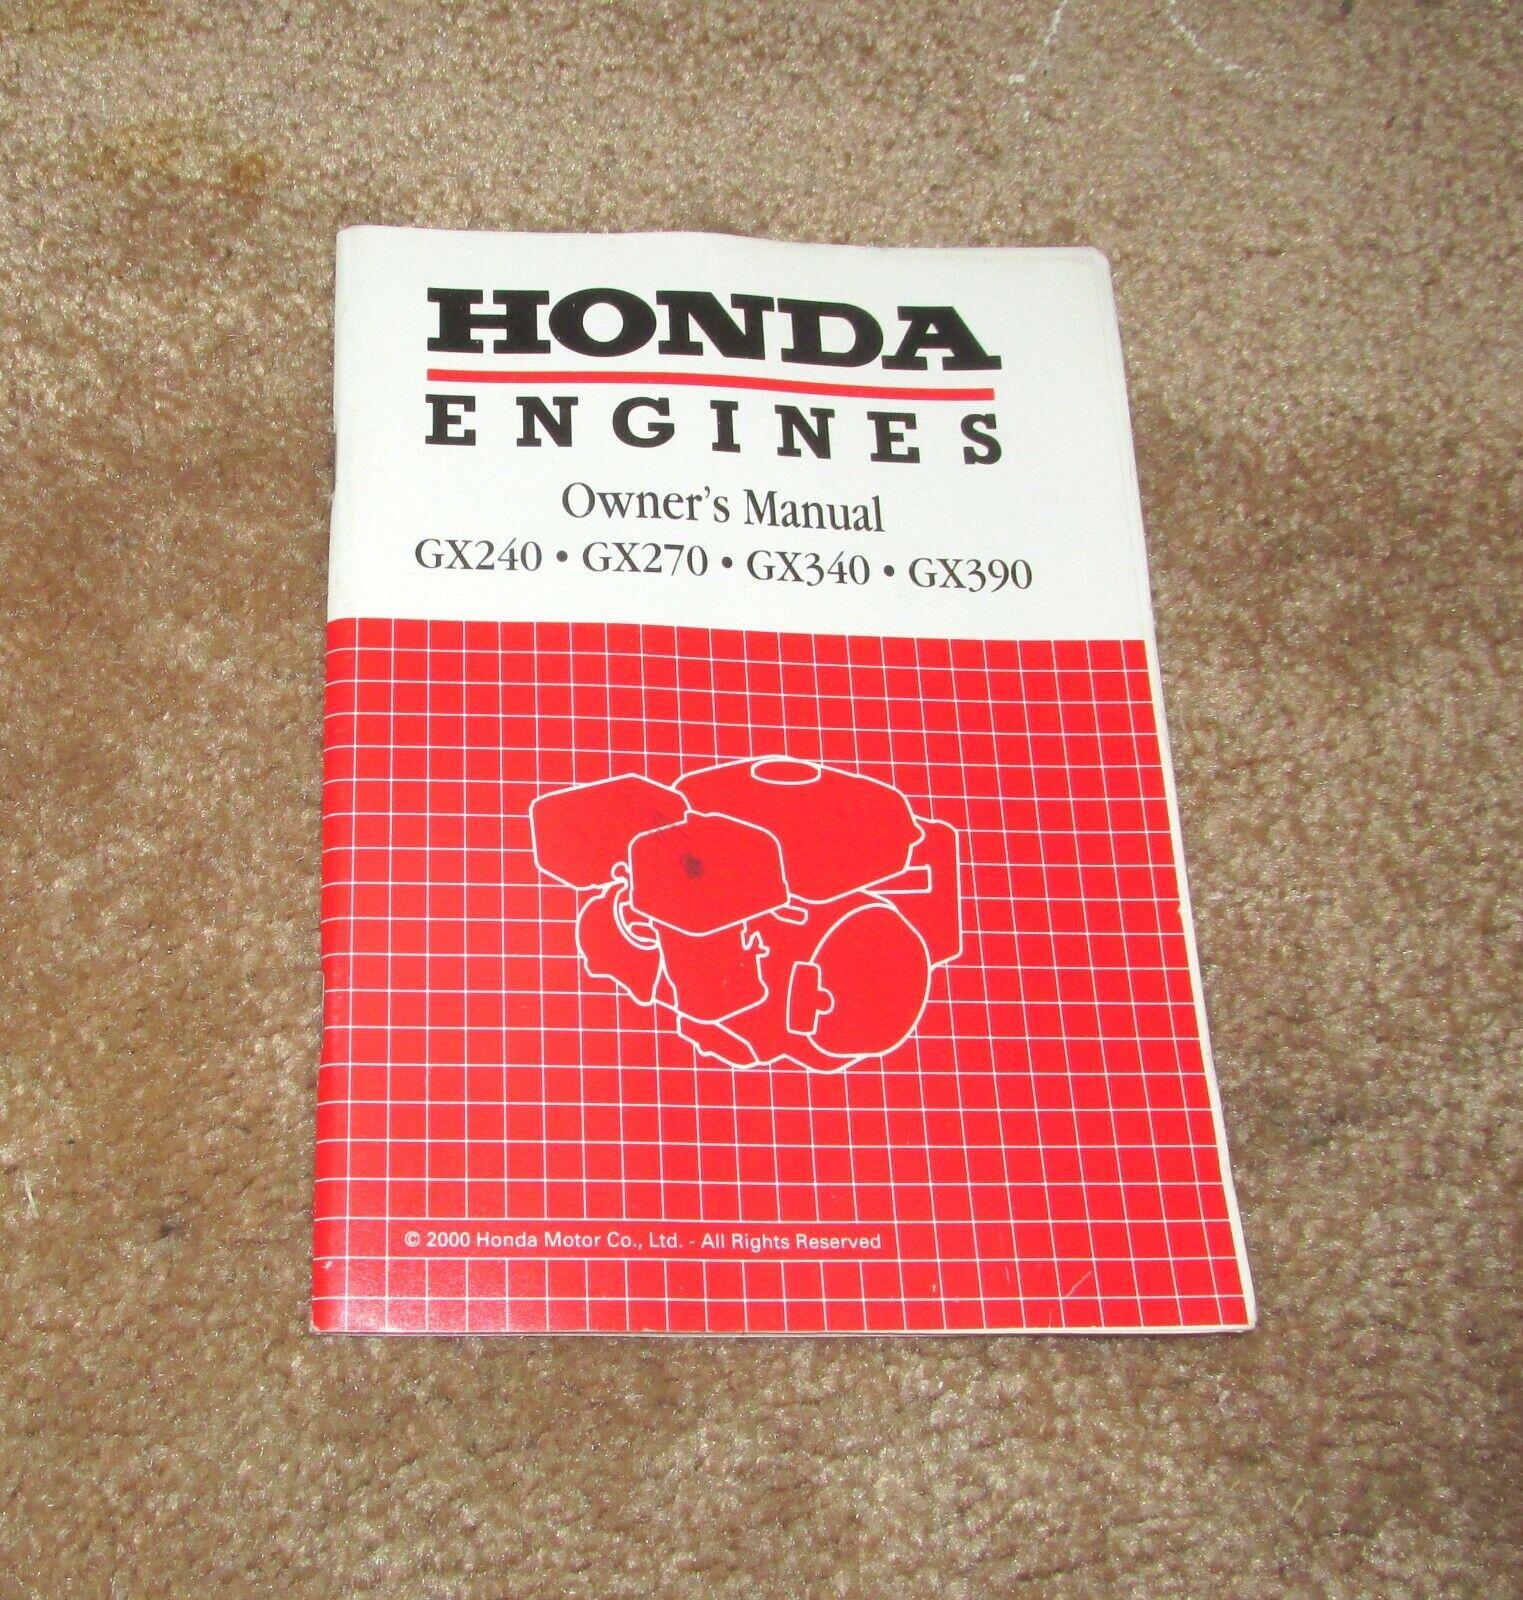 Honda OEM Owner/'s Manual  GX240 GX270 GX340 GX390 Engine Original Shop Book